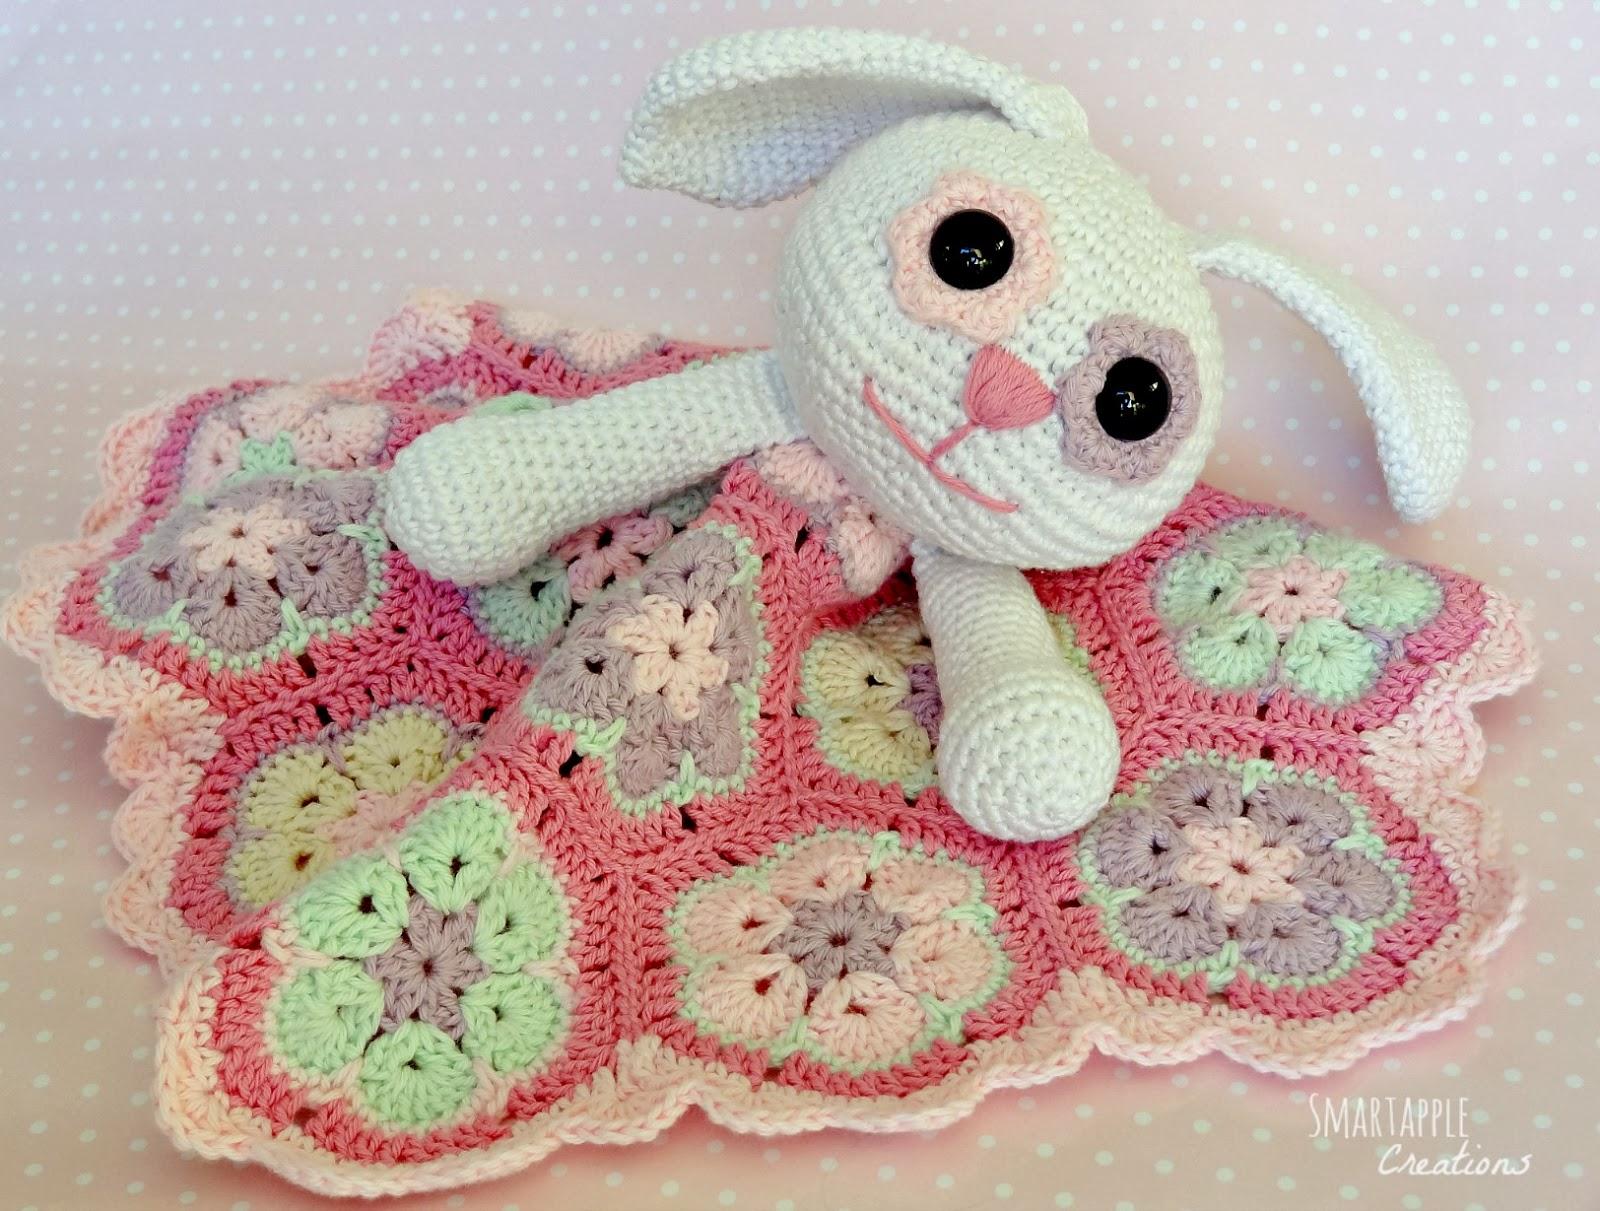 Crochet Amigurumi African Flower : Smartapple Creations - amigurumi and crochet: Crochet ...